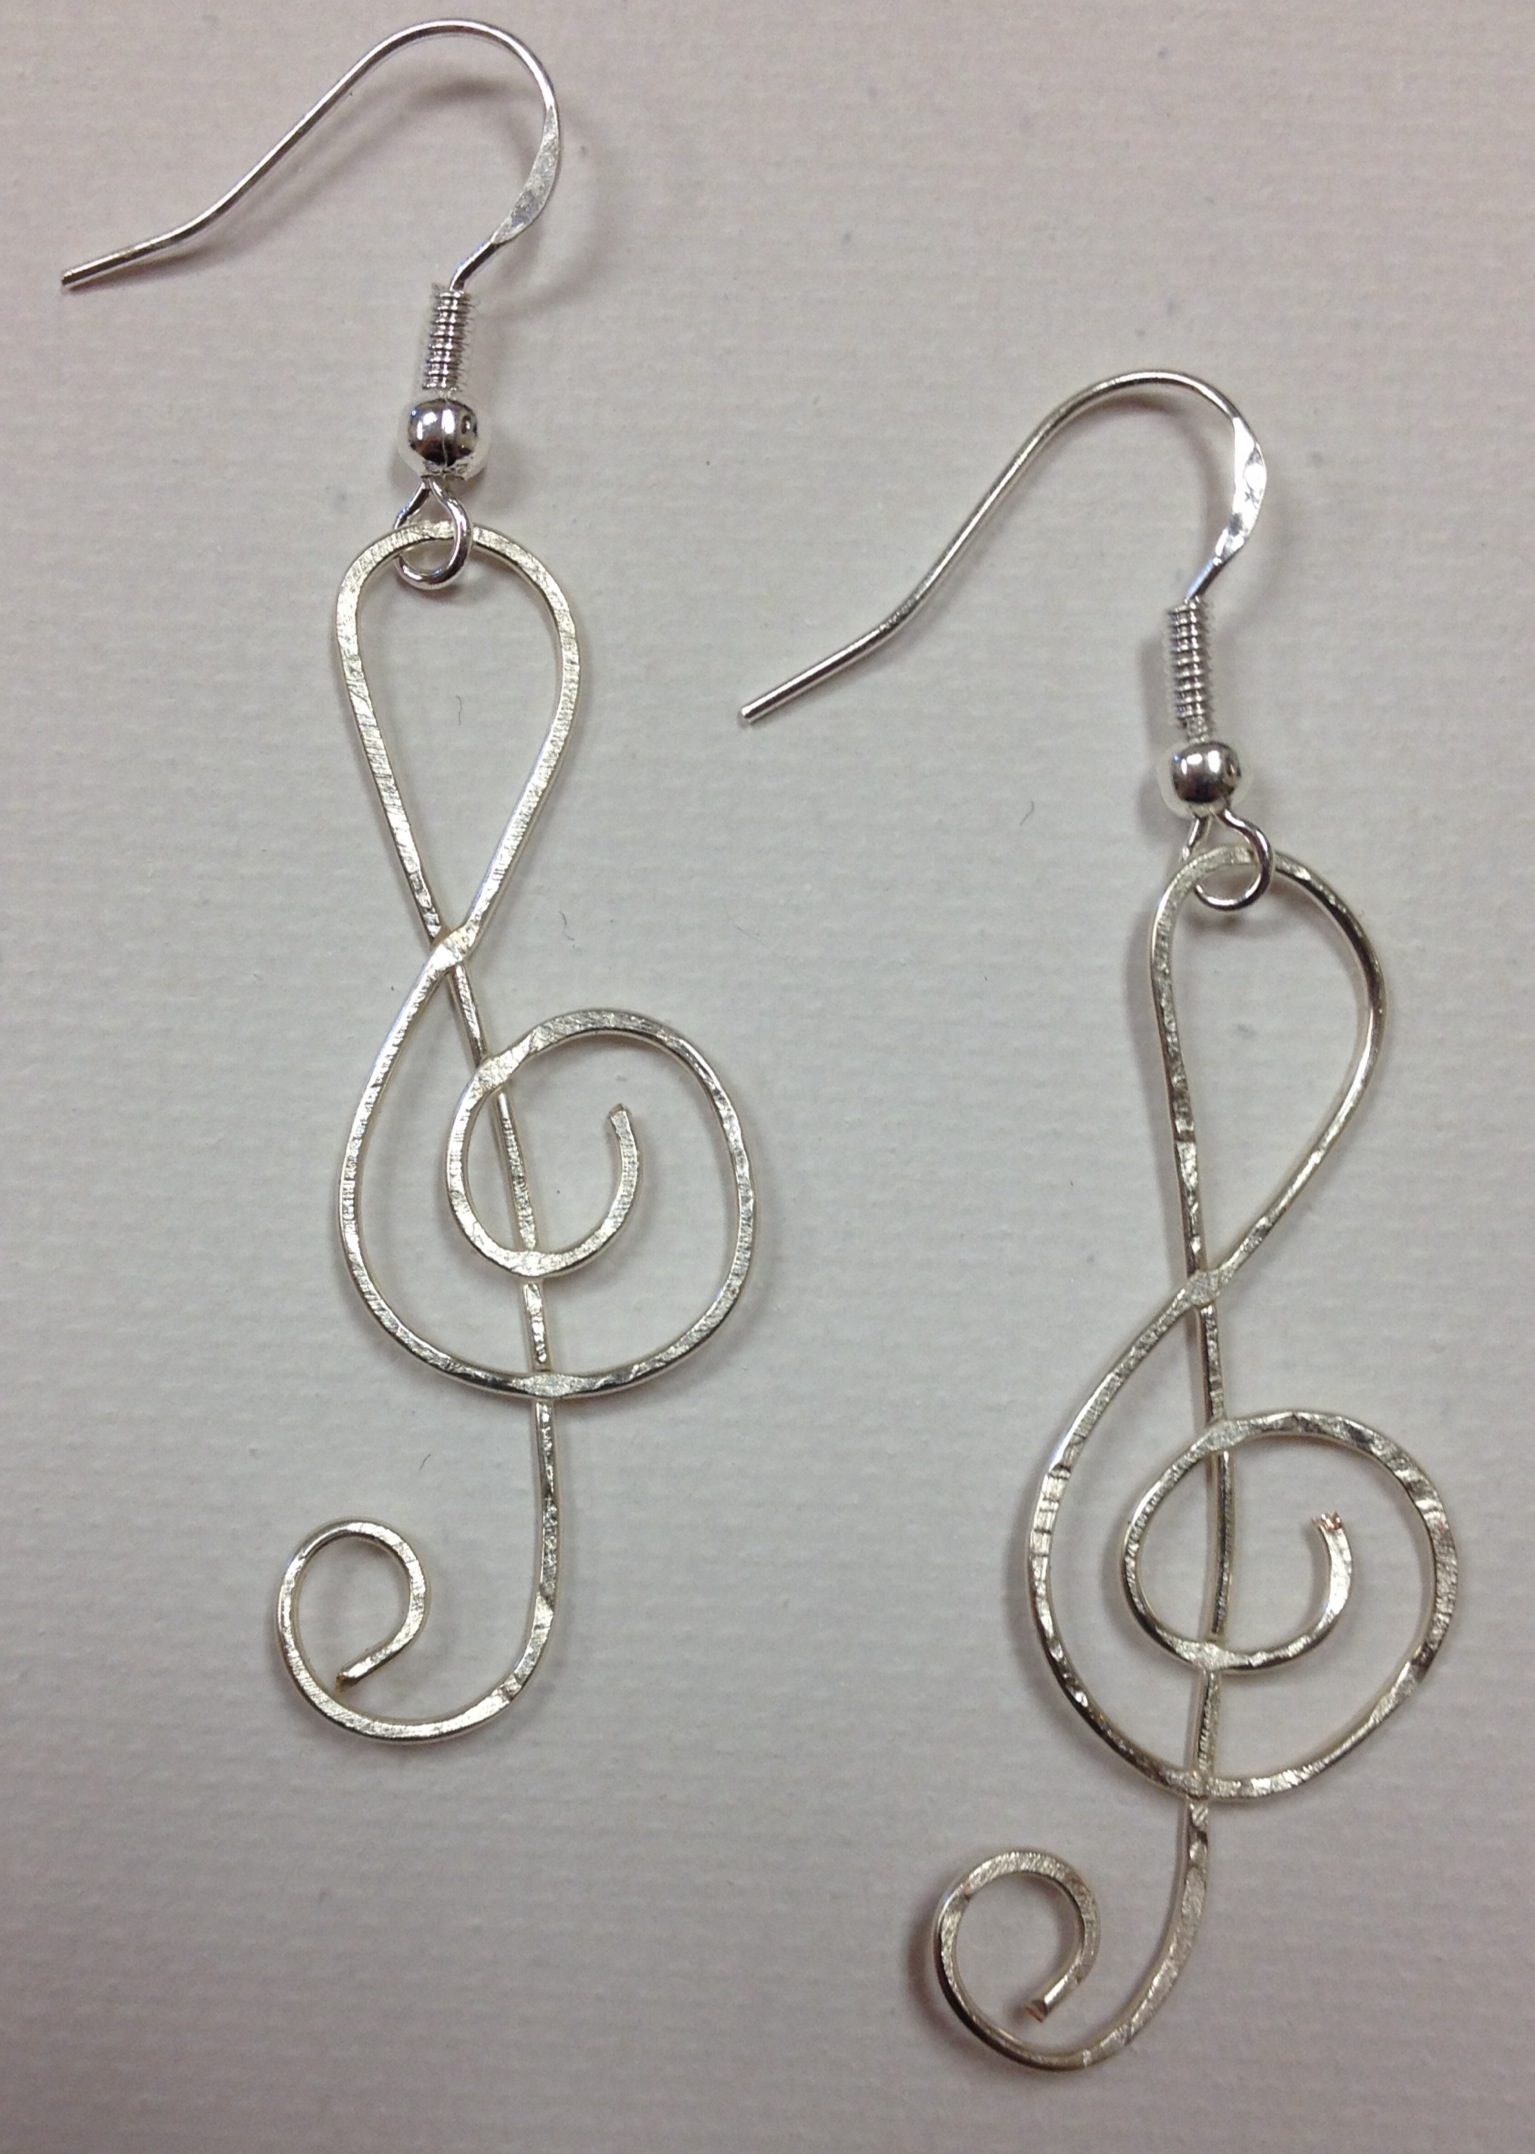 Music Treble Clef Earrings On Sterling Silver Earwires